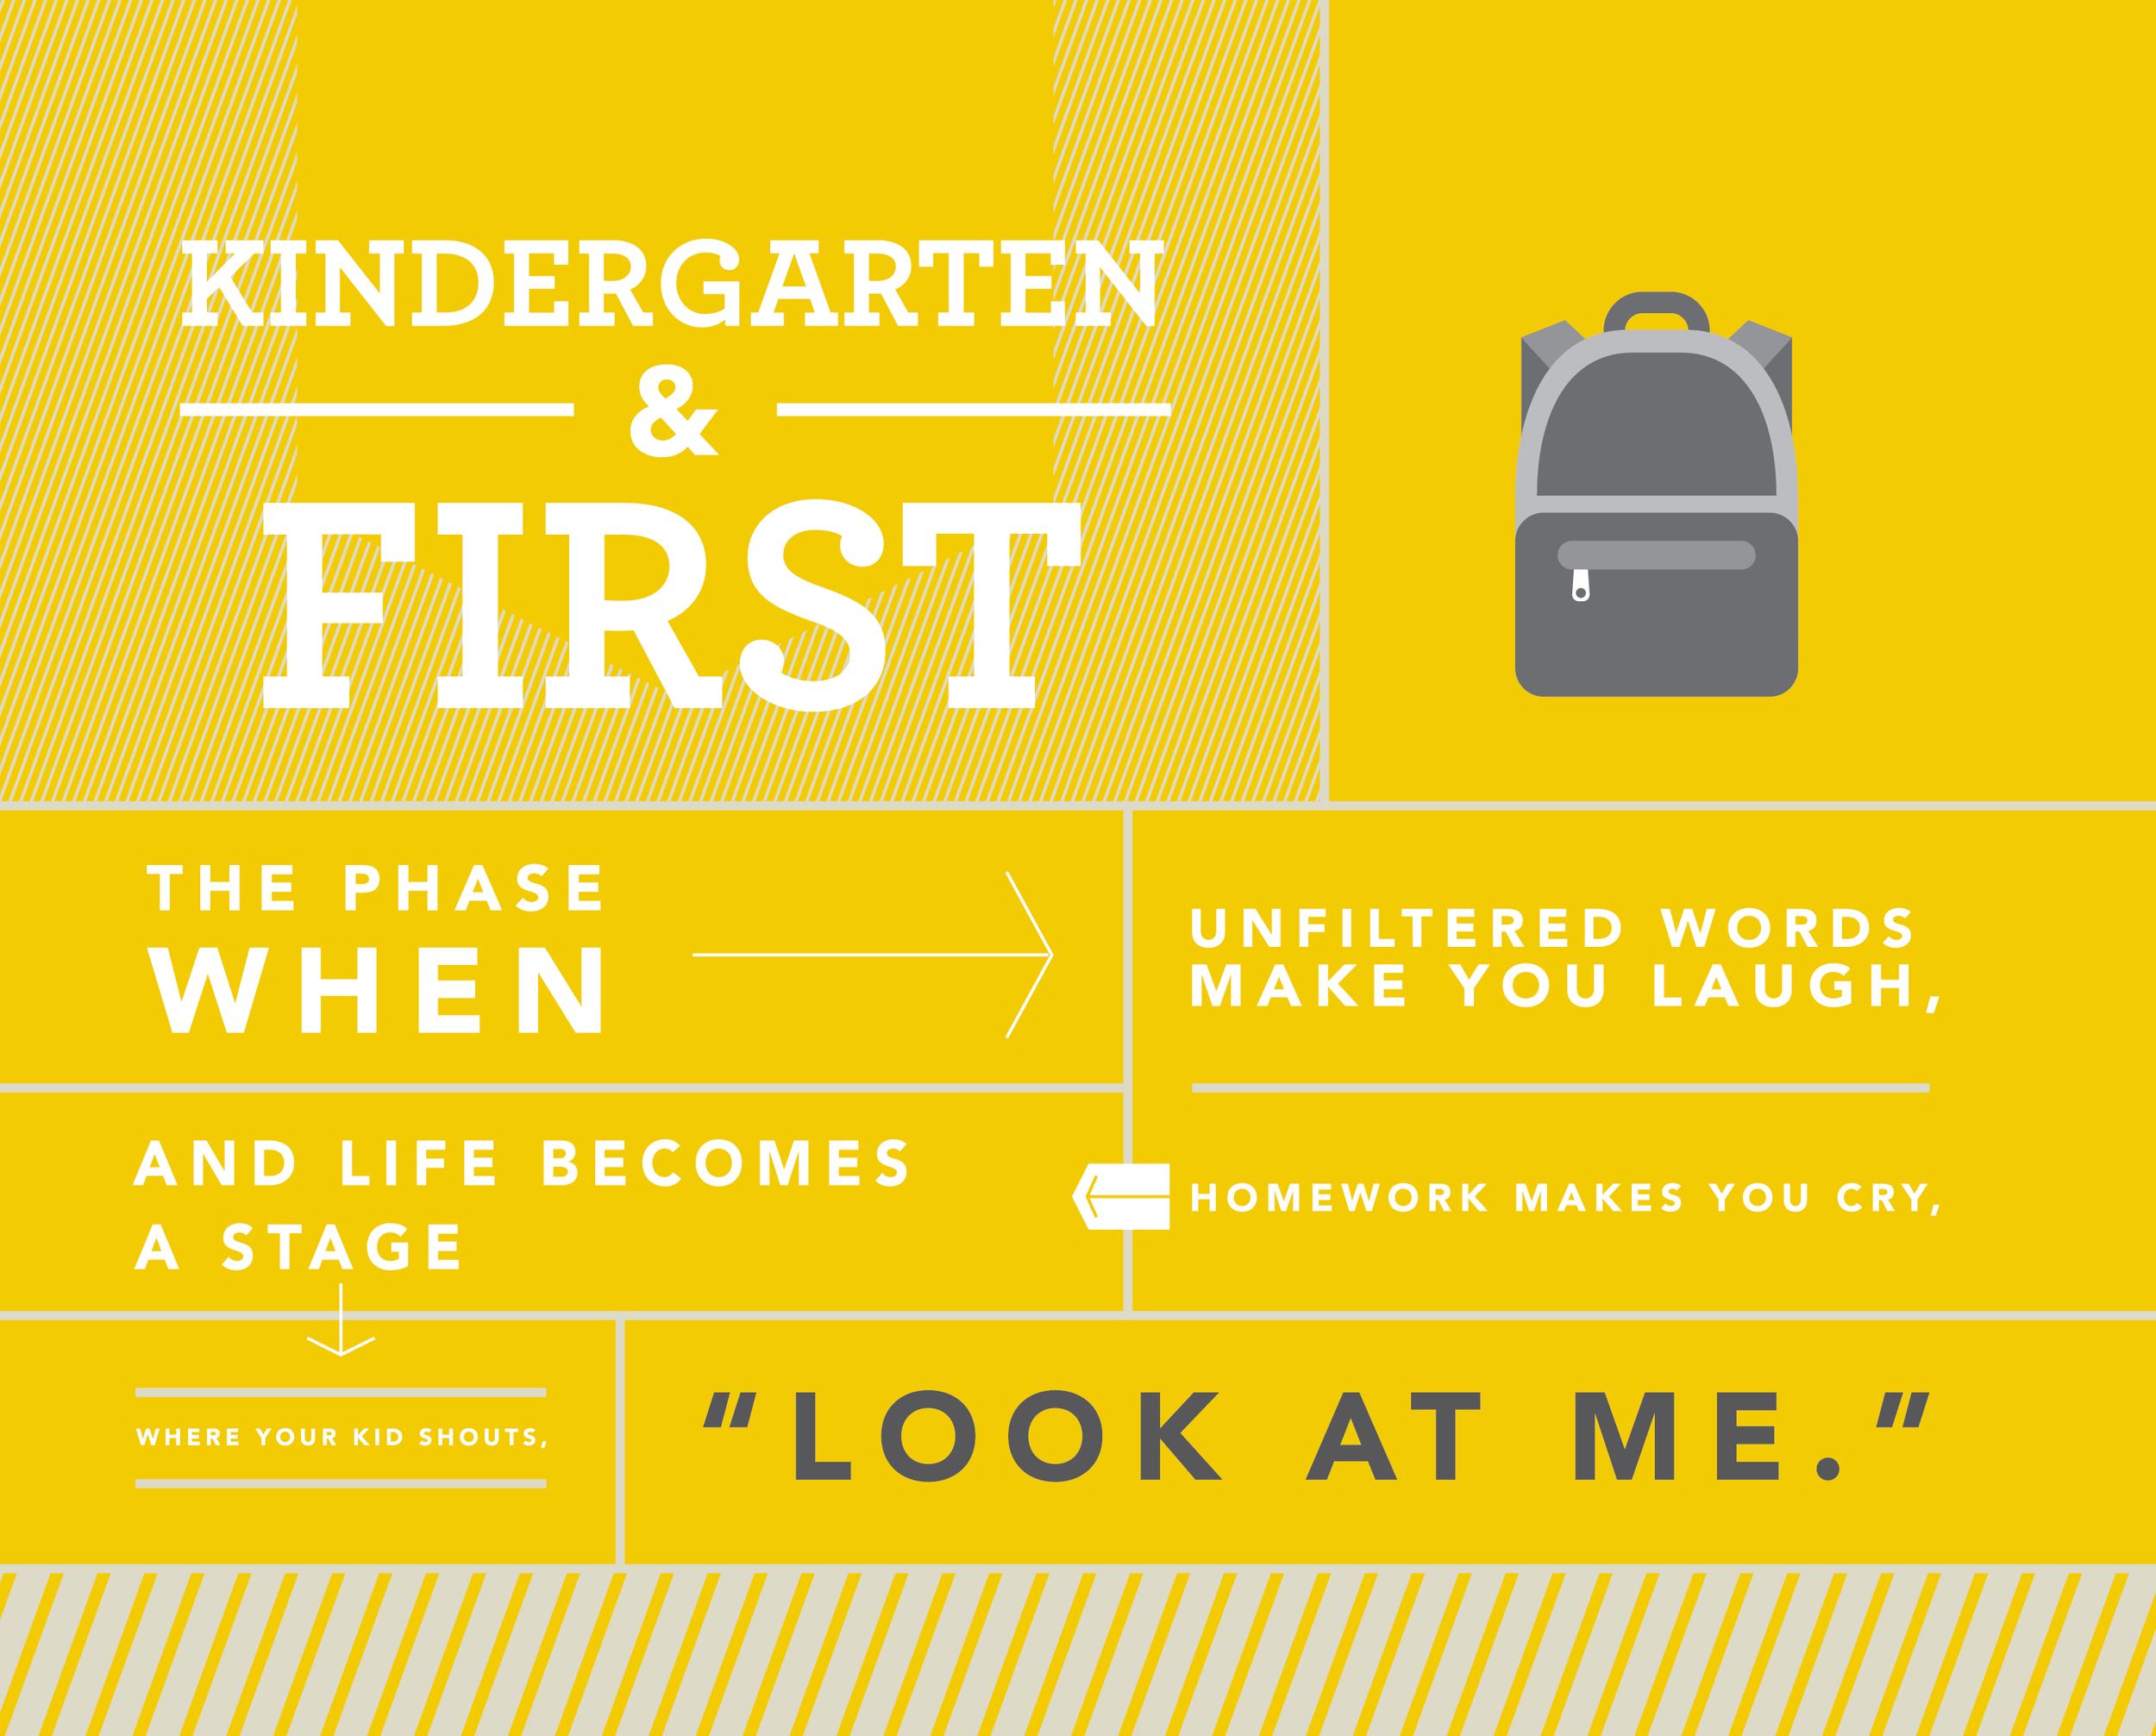 5. Kindergarten & First-01.png